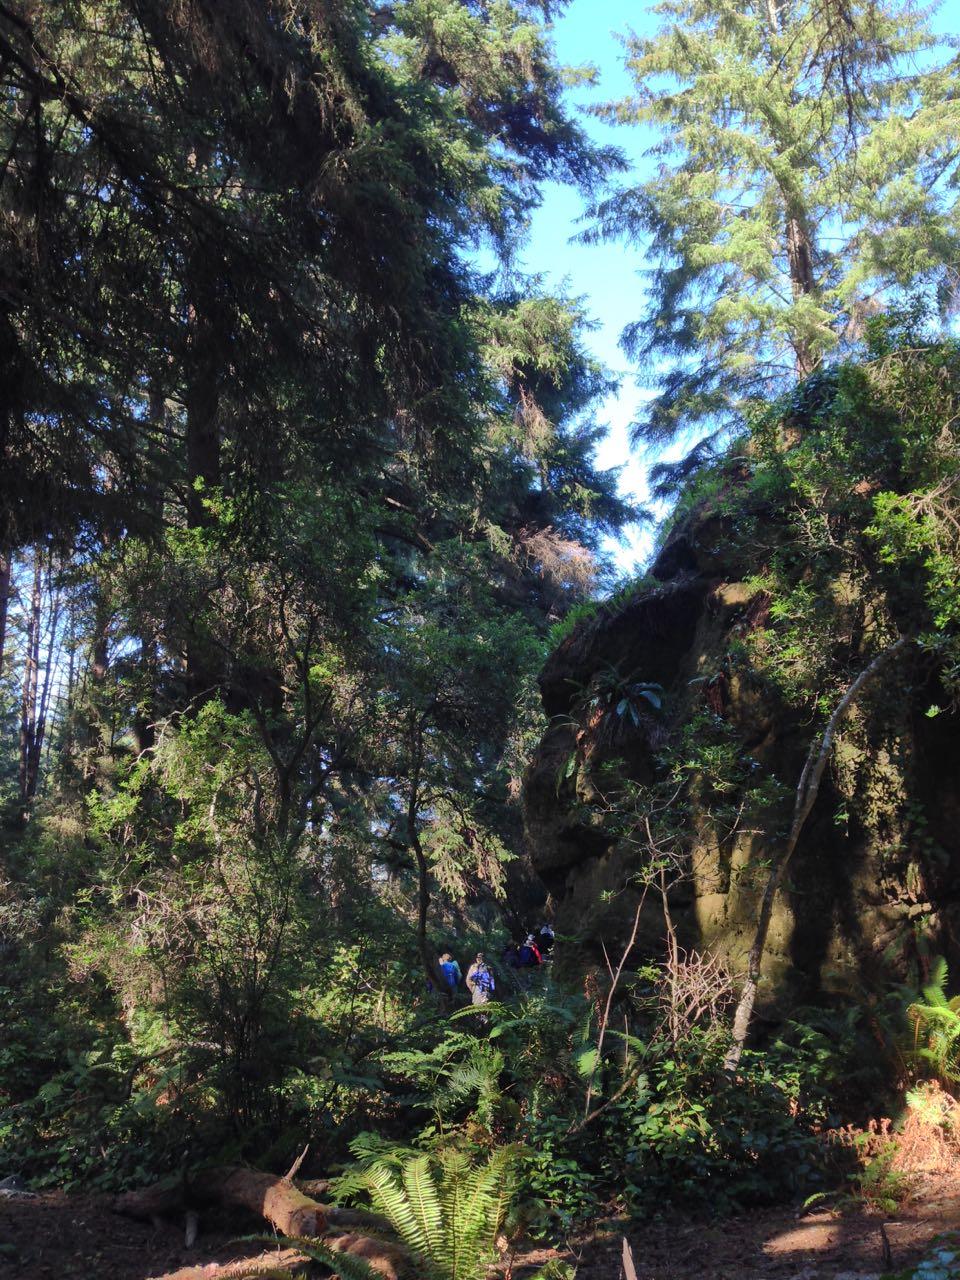 Redwoods 2017 10 08 168 Of 287